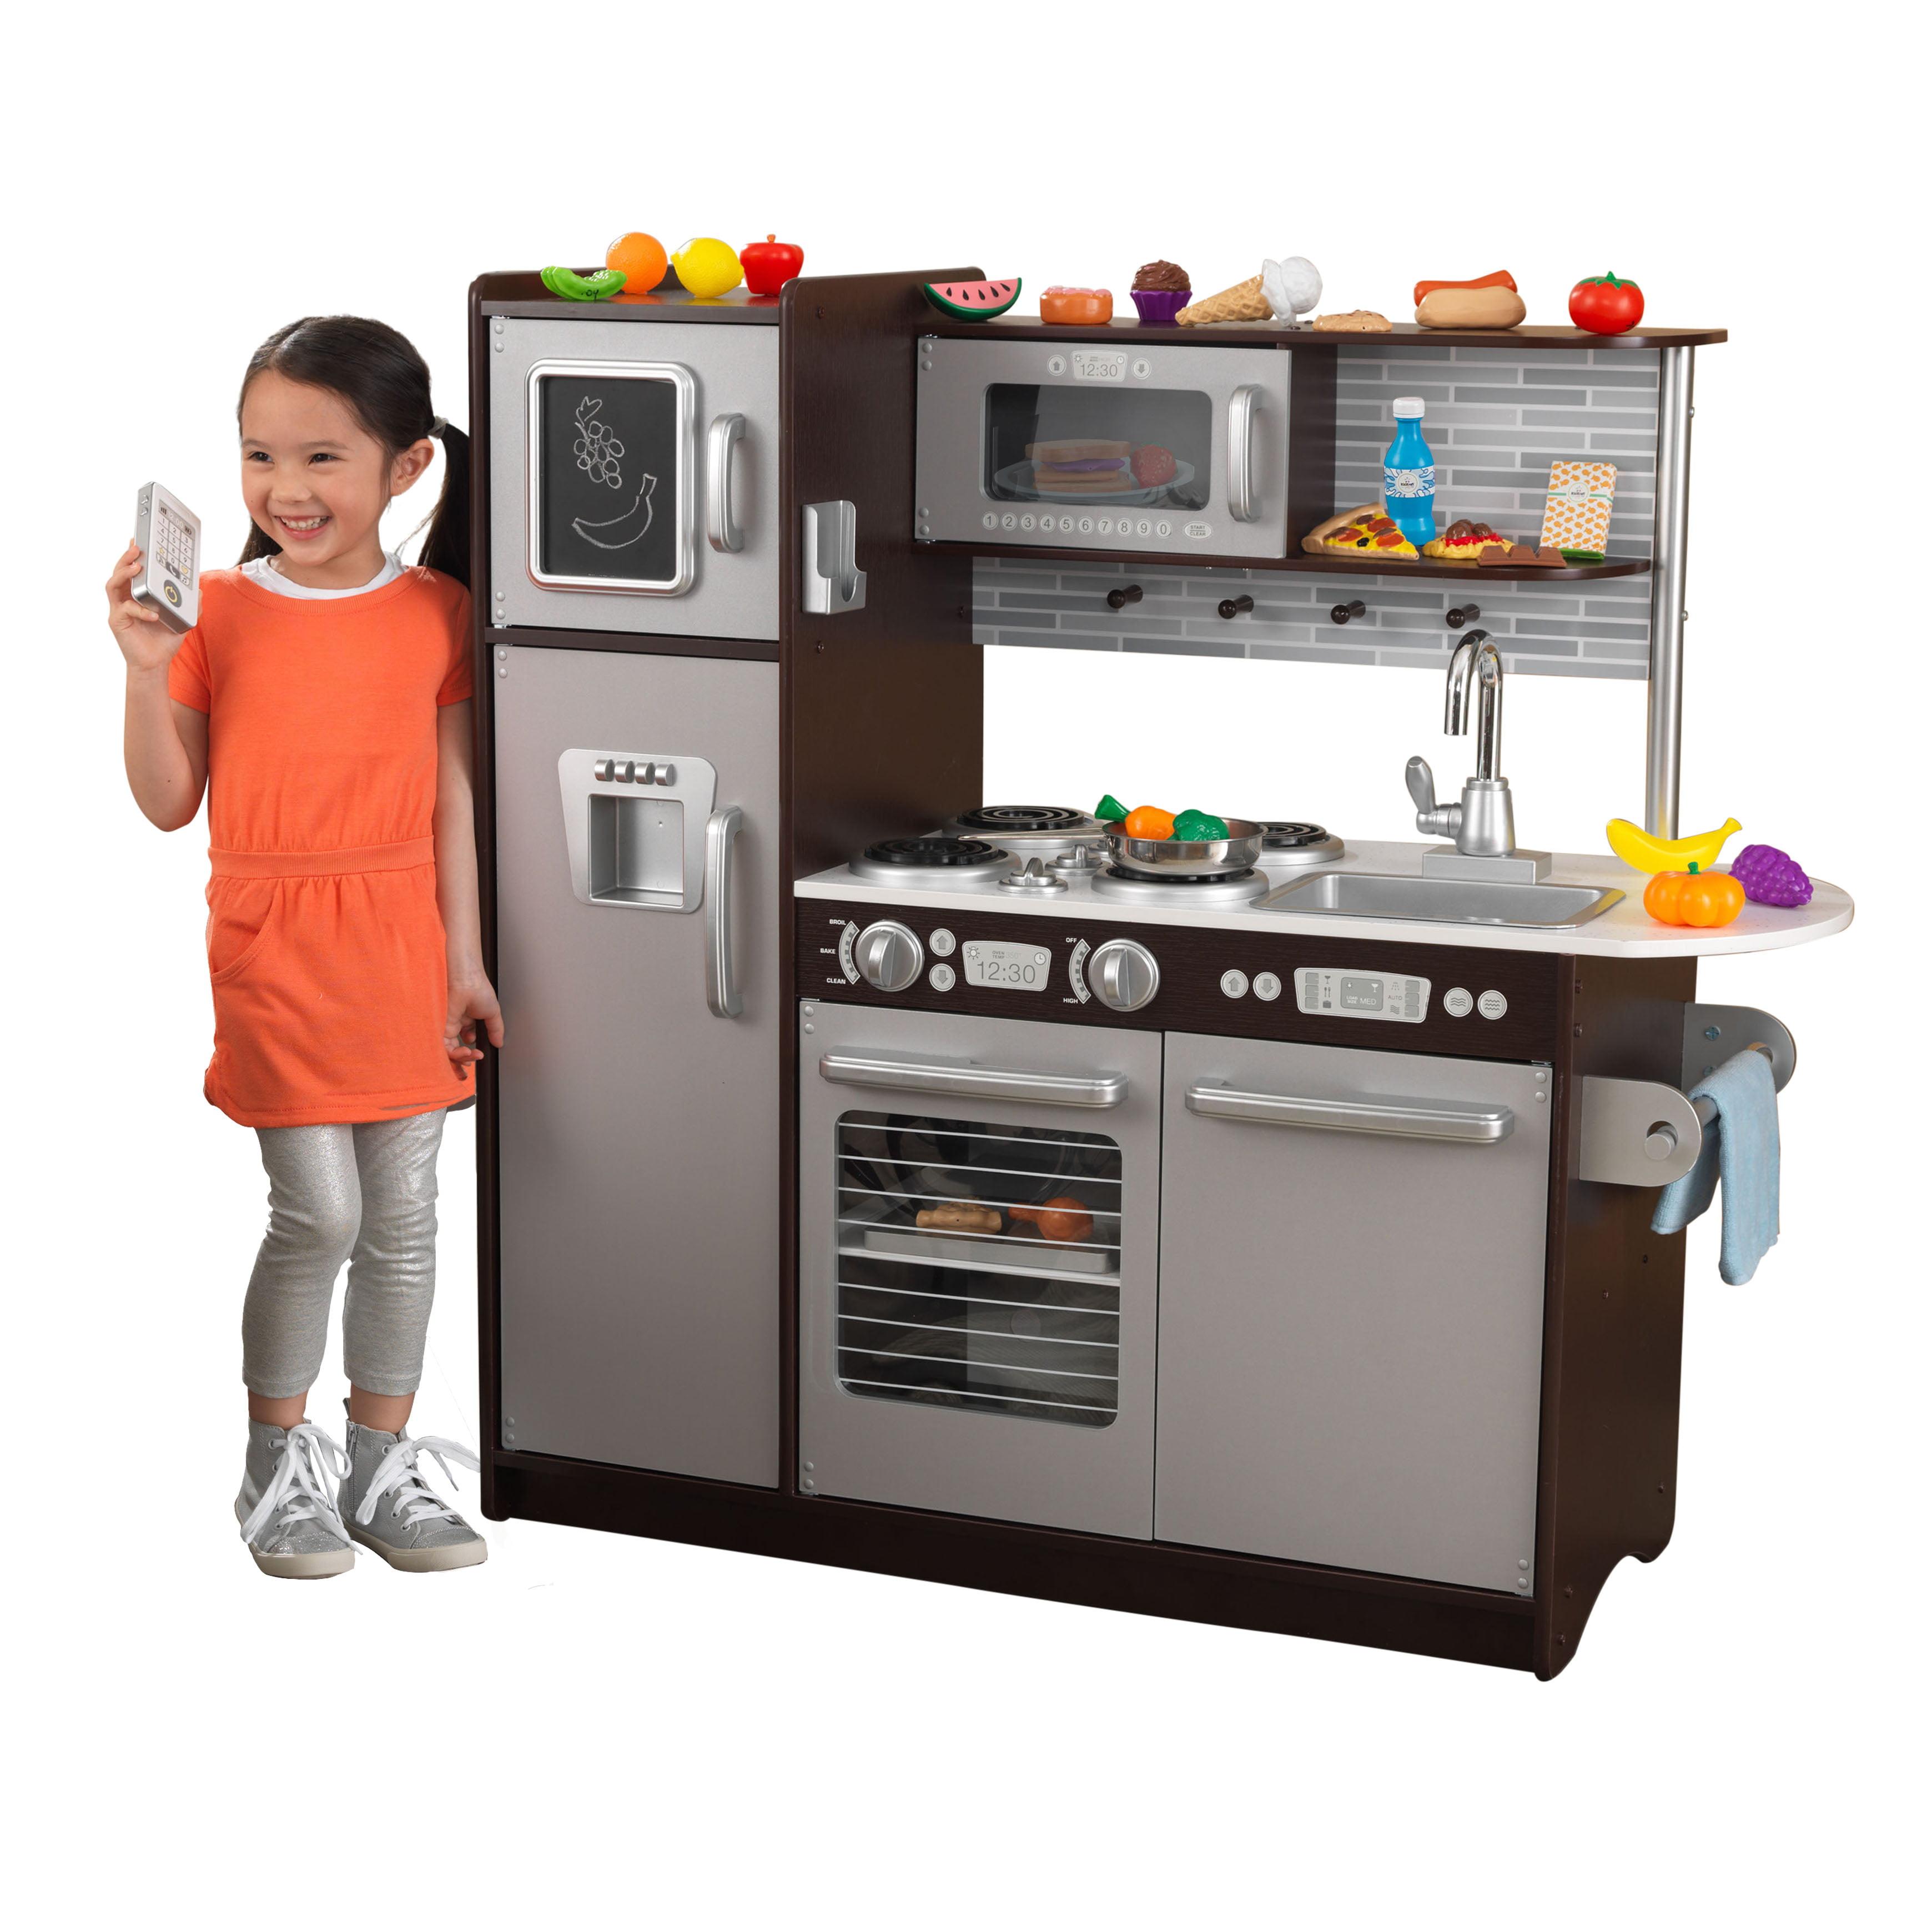 KidKraft Uptown Espresso Kitchen with 30 Piece Play Food by KidKraft